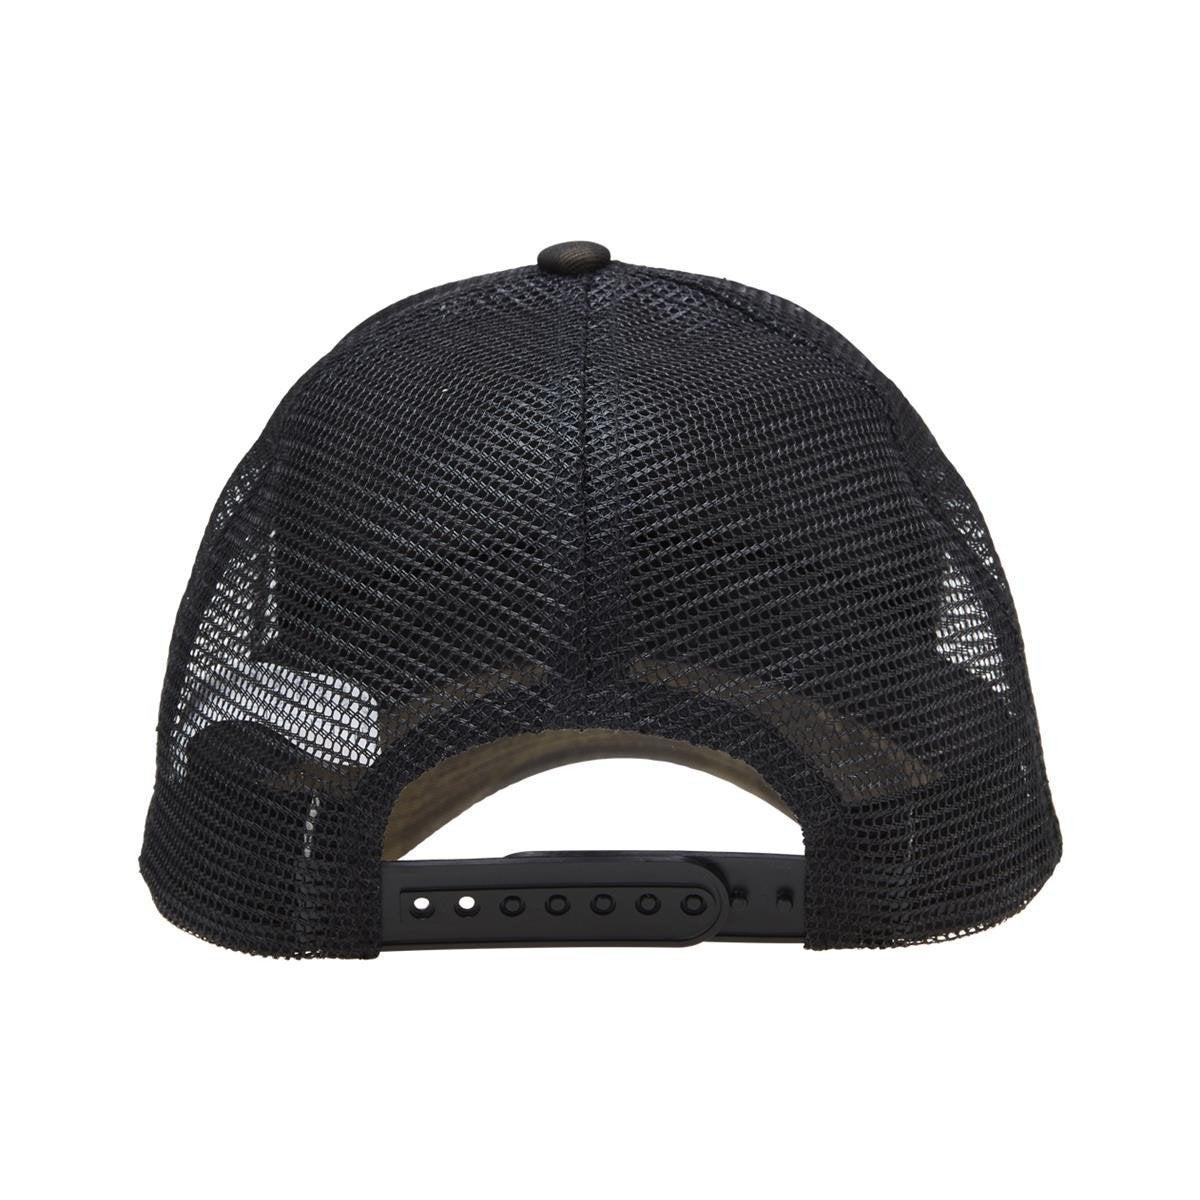 Black Camo Trucker Cap